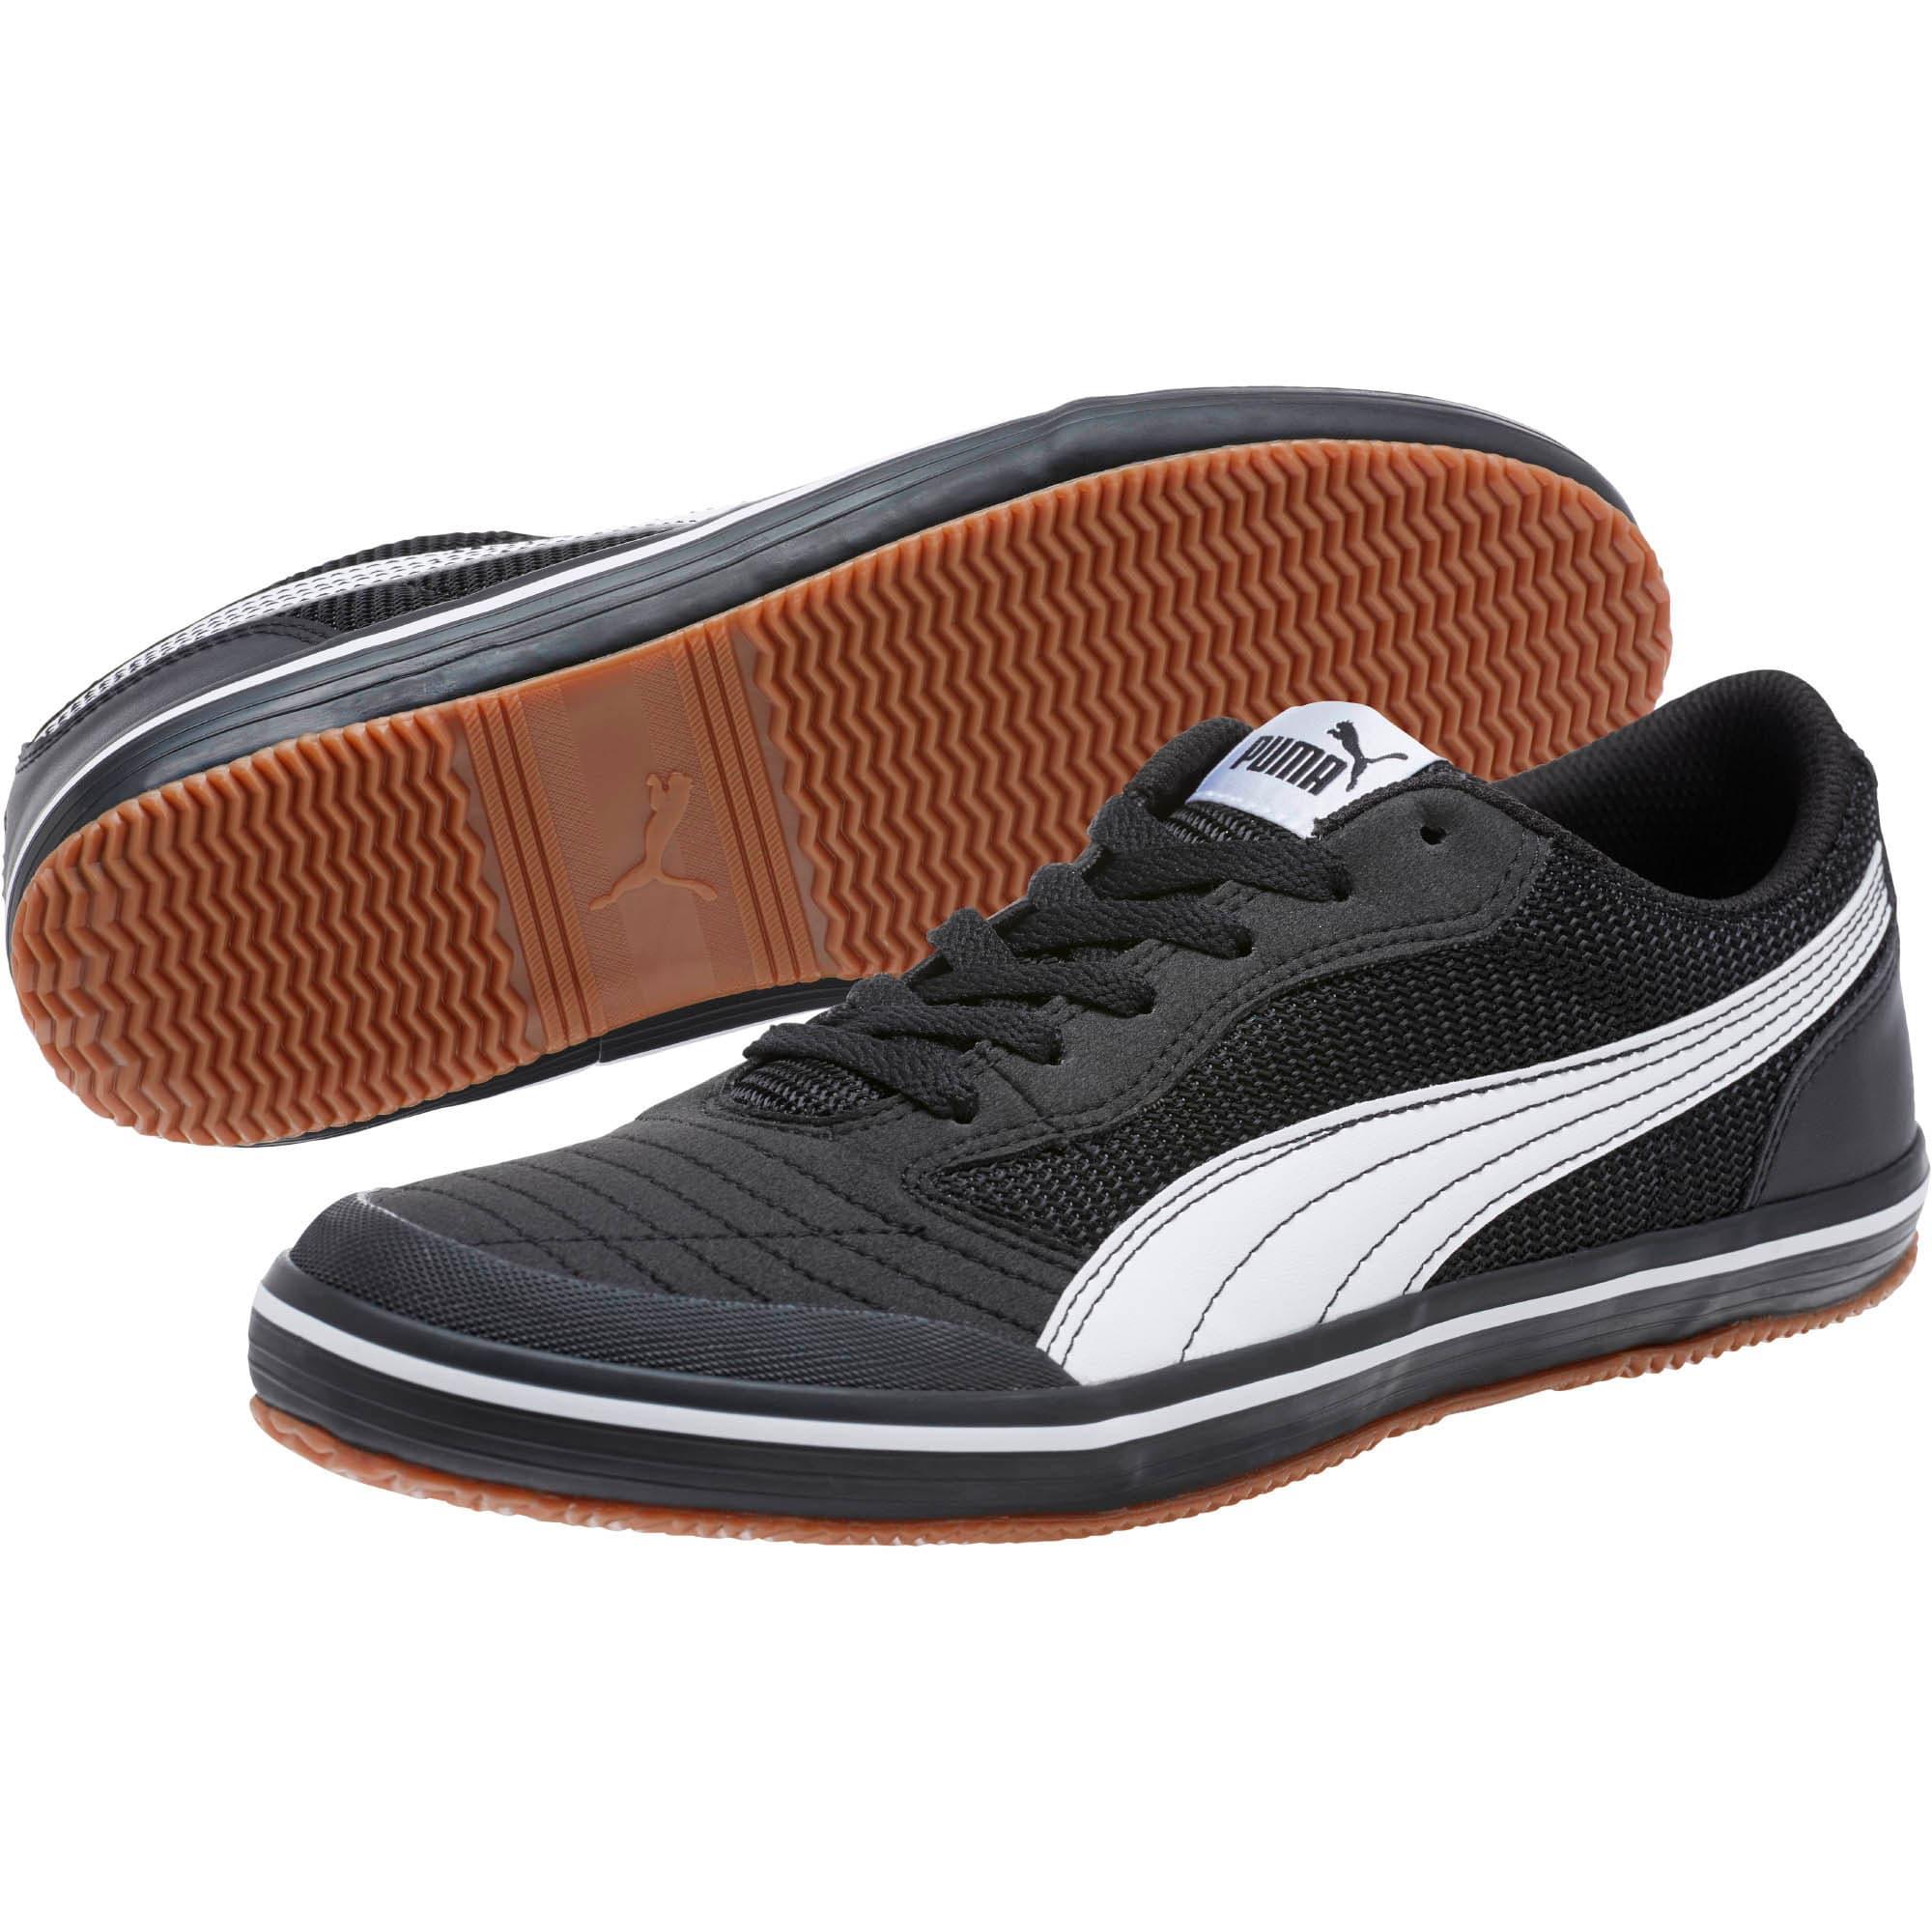 Thumbnail 2 of Astro Sala Sneakers, Puma Black-Puma White, medium